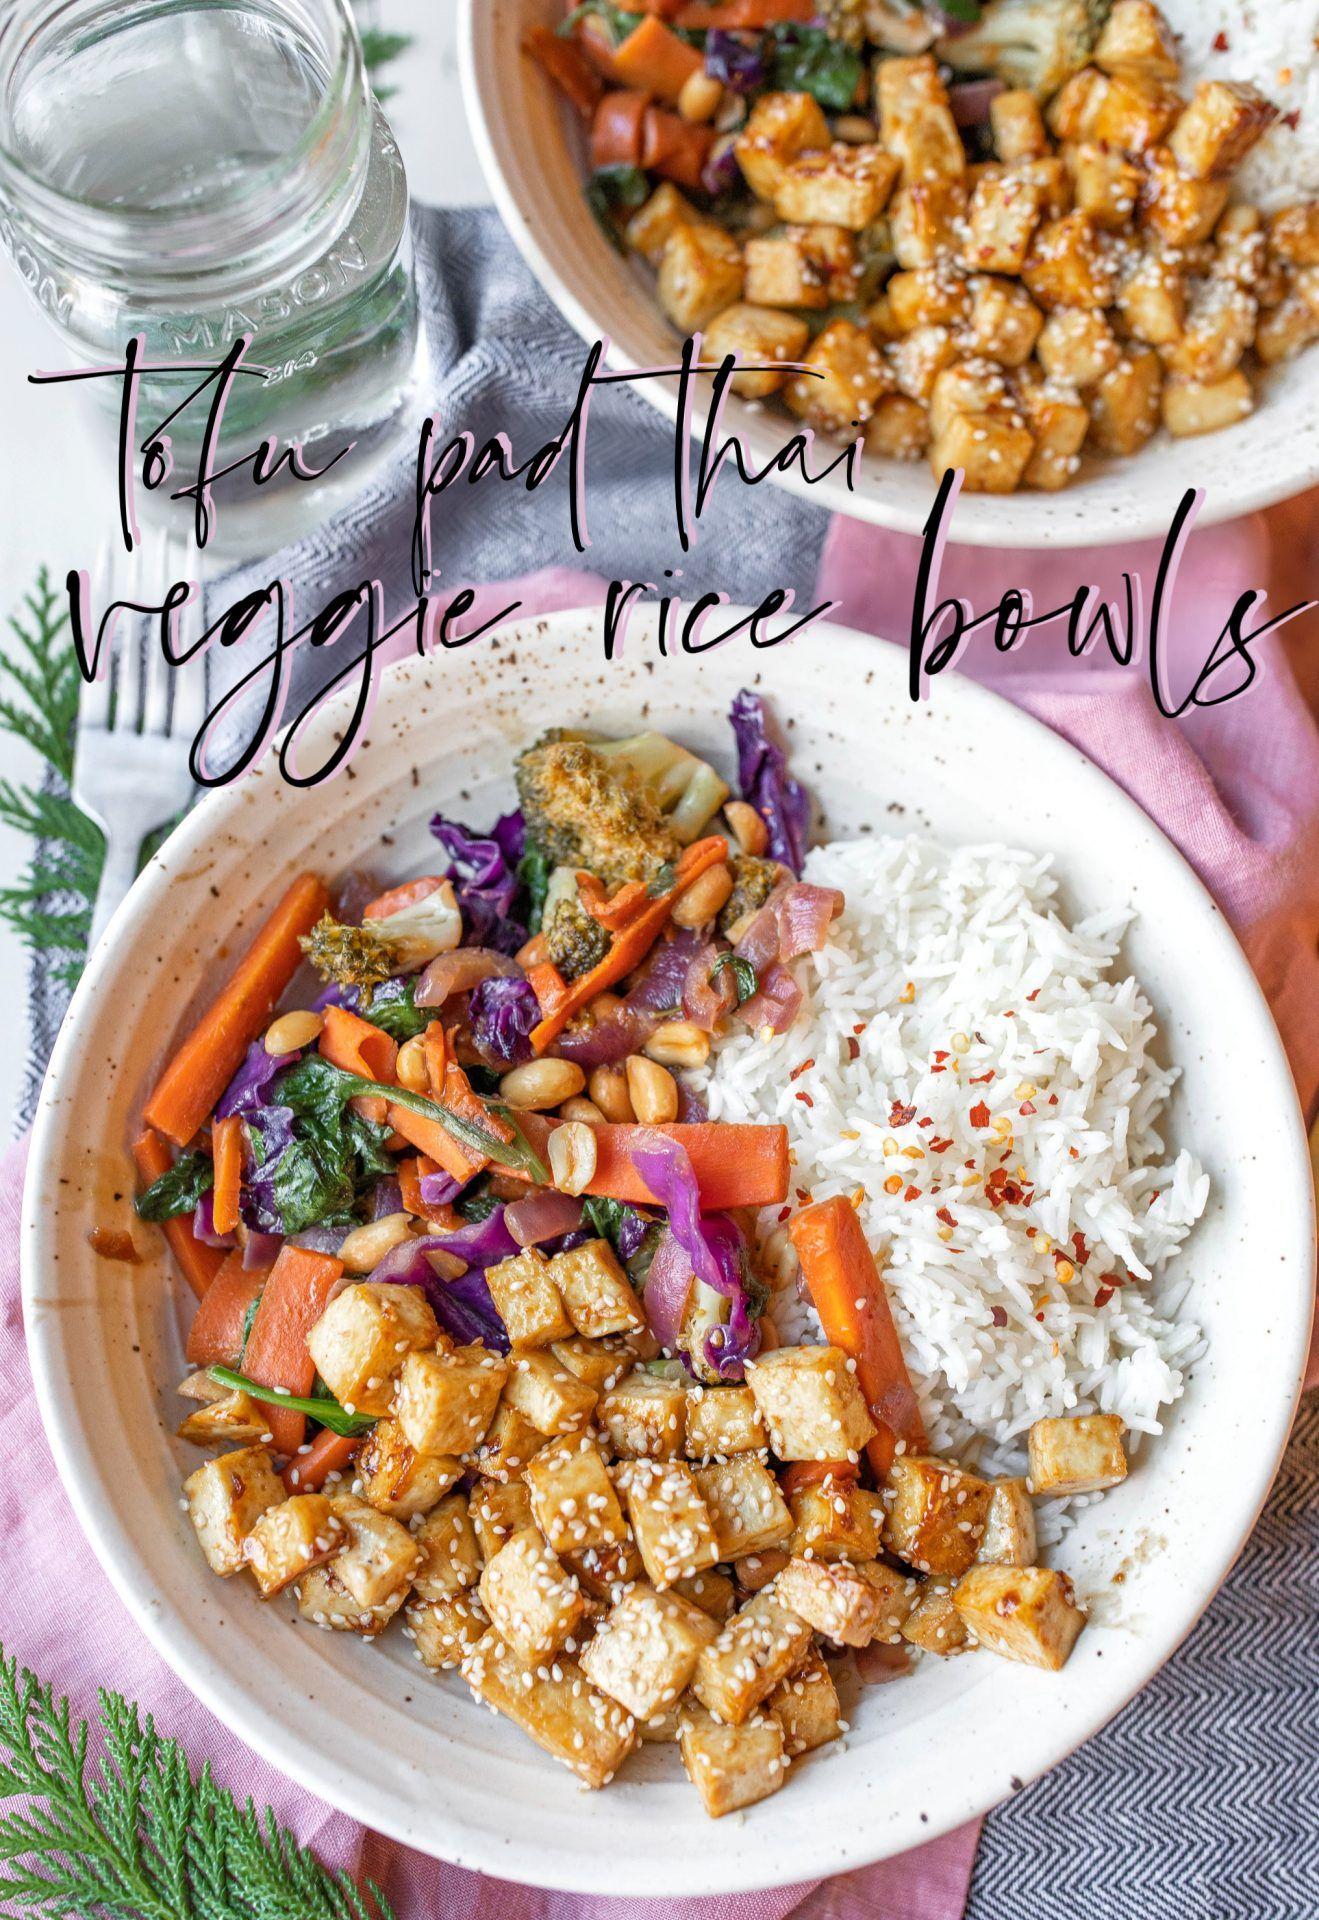 Tofu Veggie Pad Thai Rice Bowls Vegan Gluten Free Simply Taralynn Recipe In 2020 Veggie Pad Thai Tofu Pad Thai